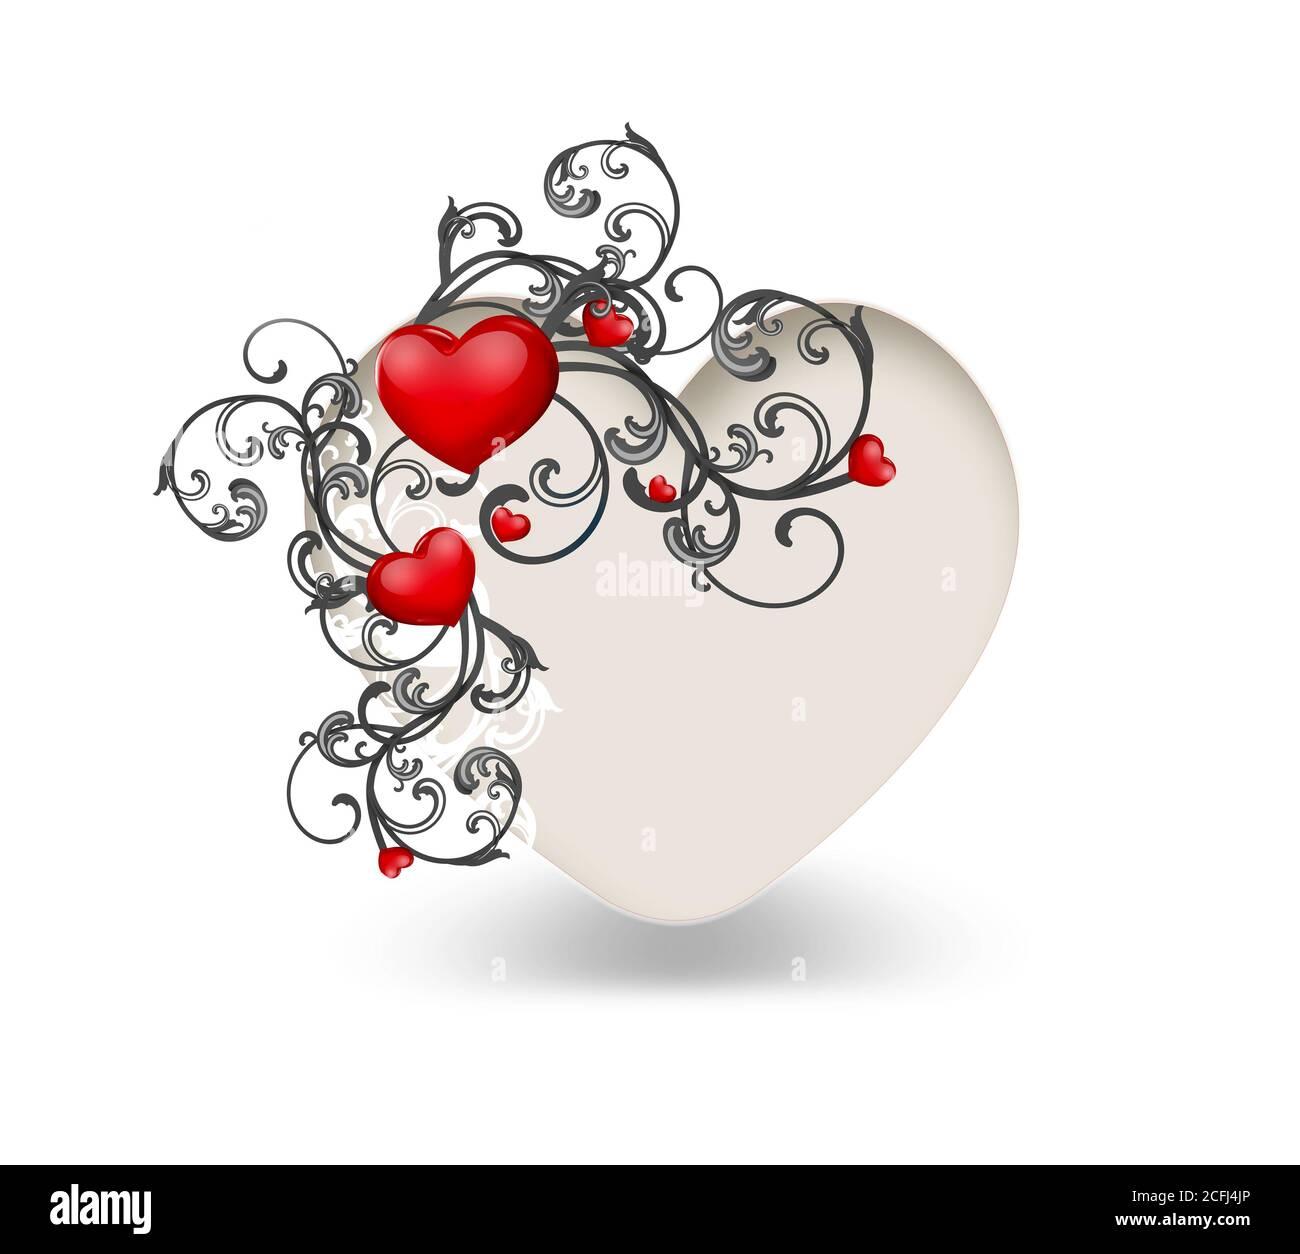 Heart Shape Floral Ornament Design Cut Out Stock Images Pictures Alamy